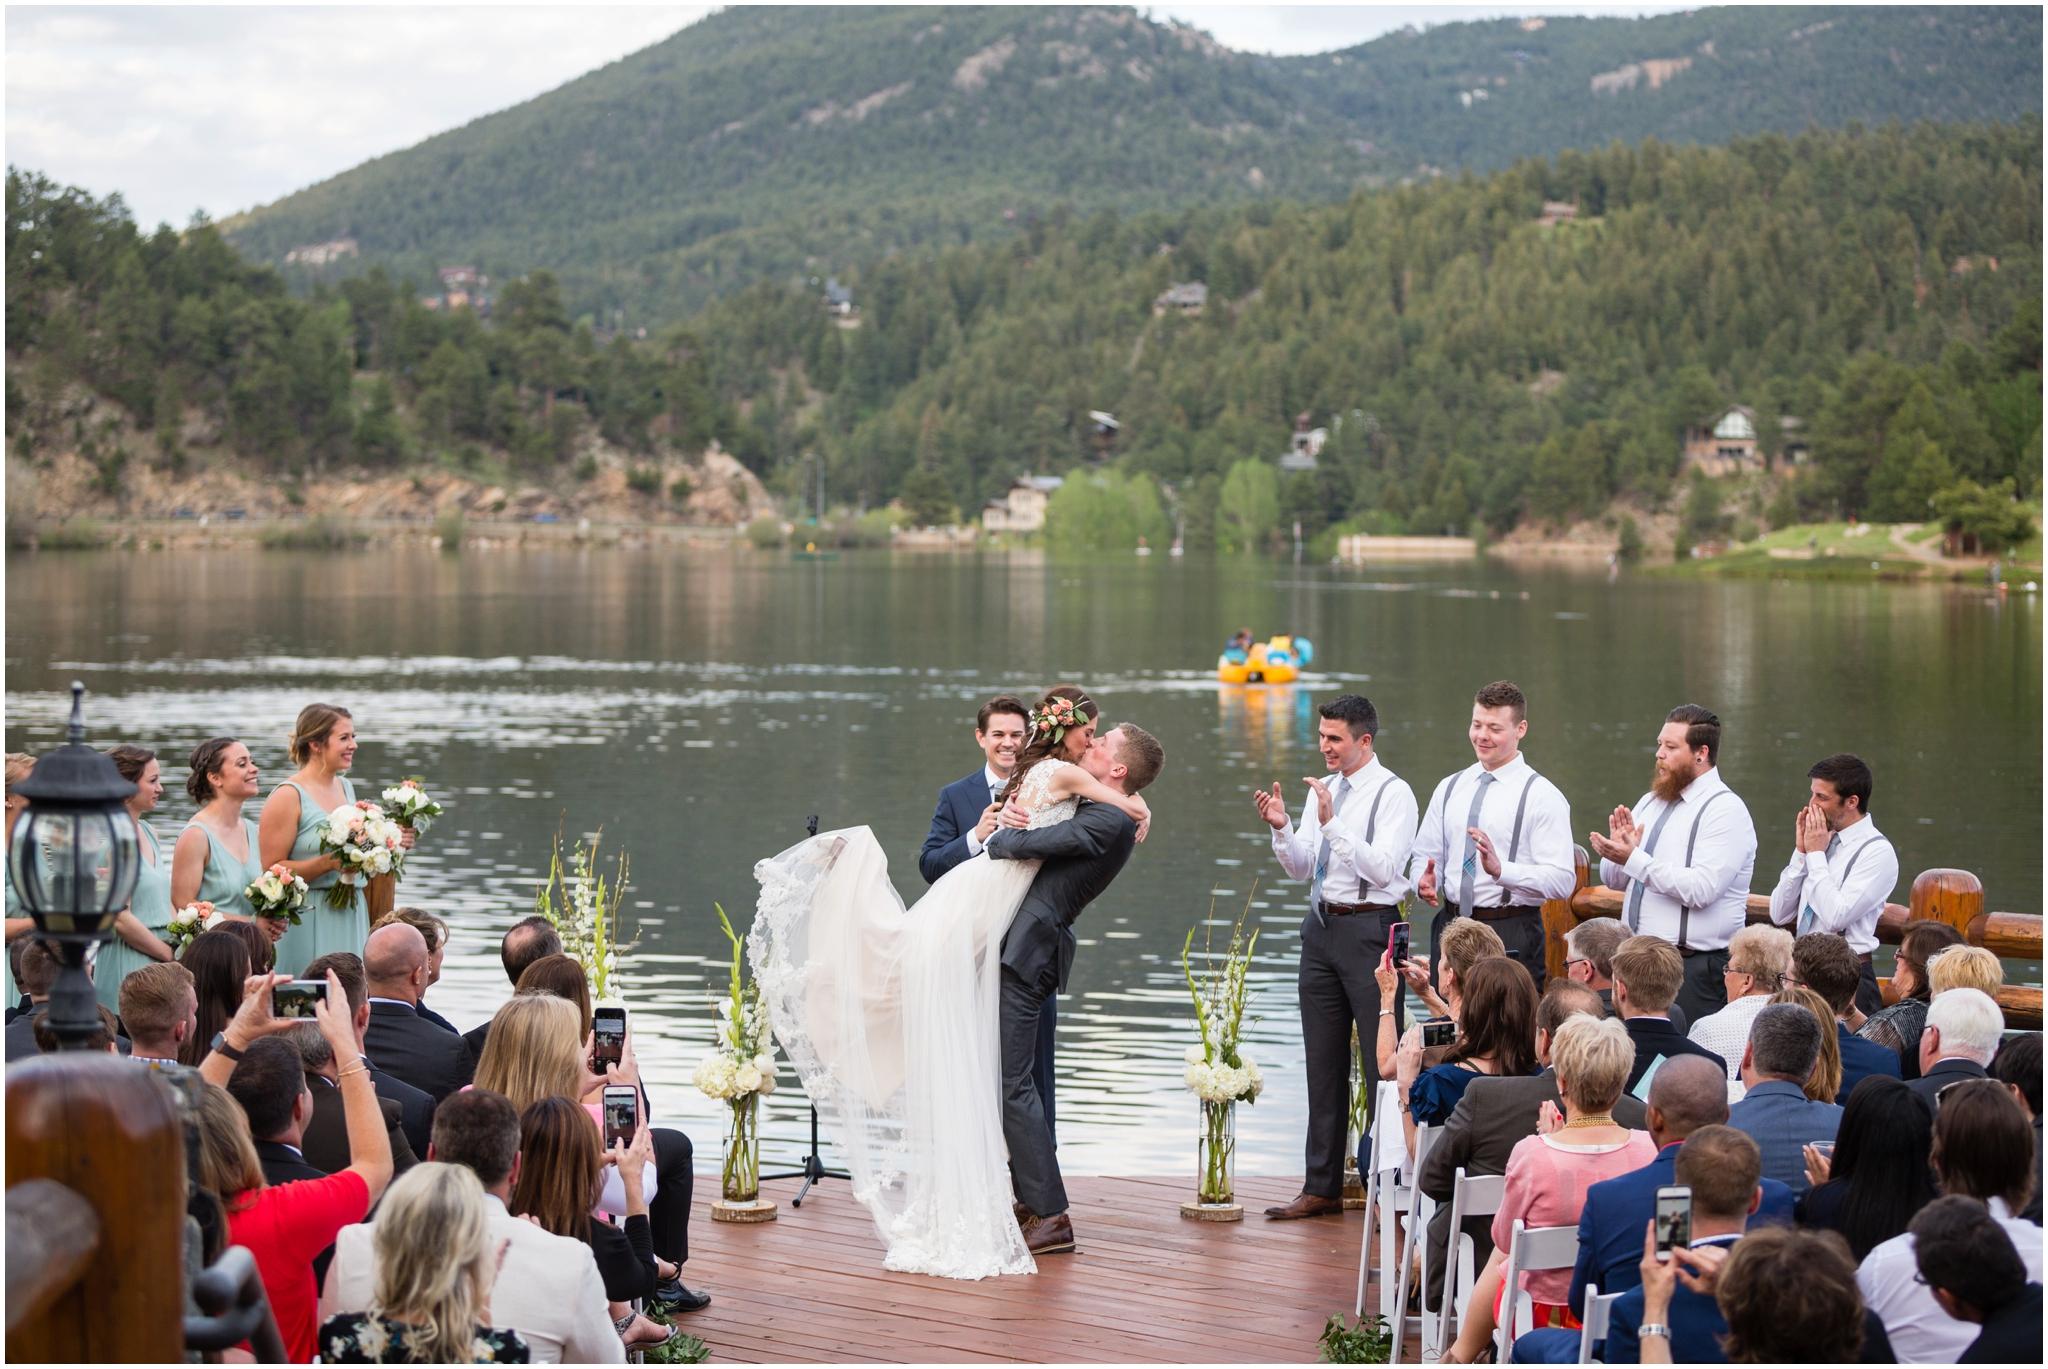 Evergreen_Lake_house_Wedding_Photography_ceremony_on_the_lake.JPG